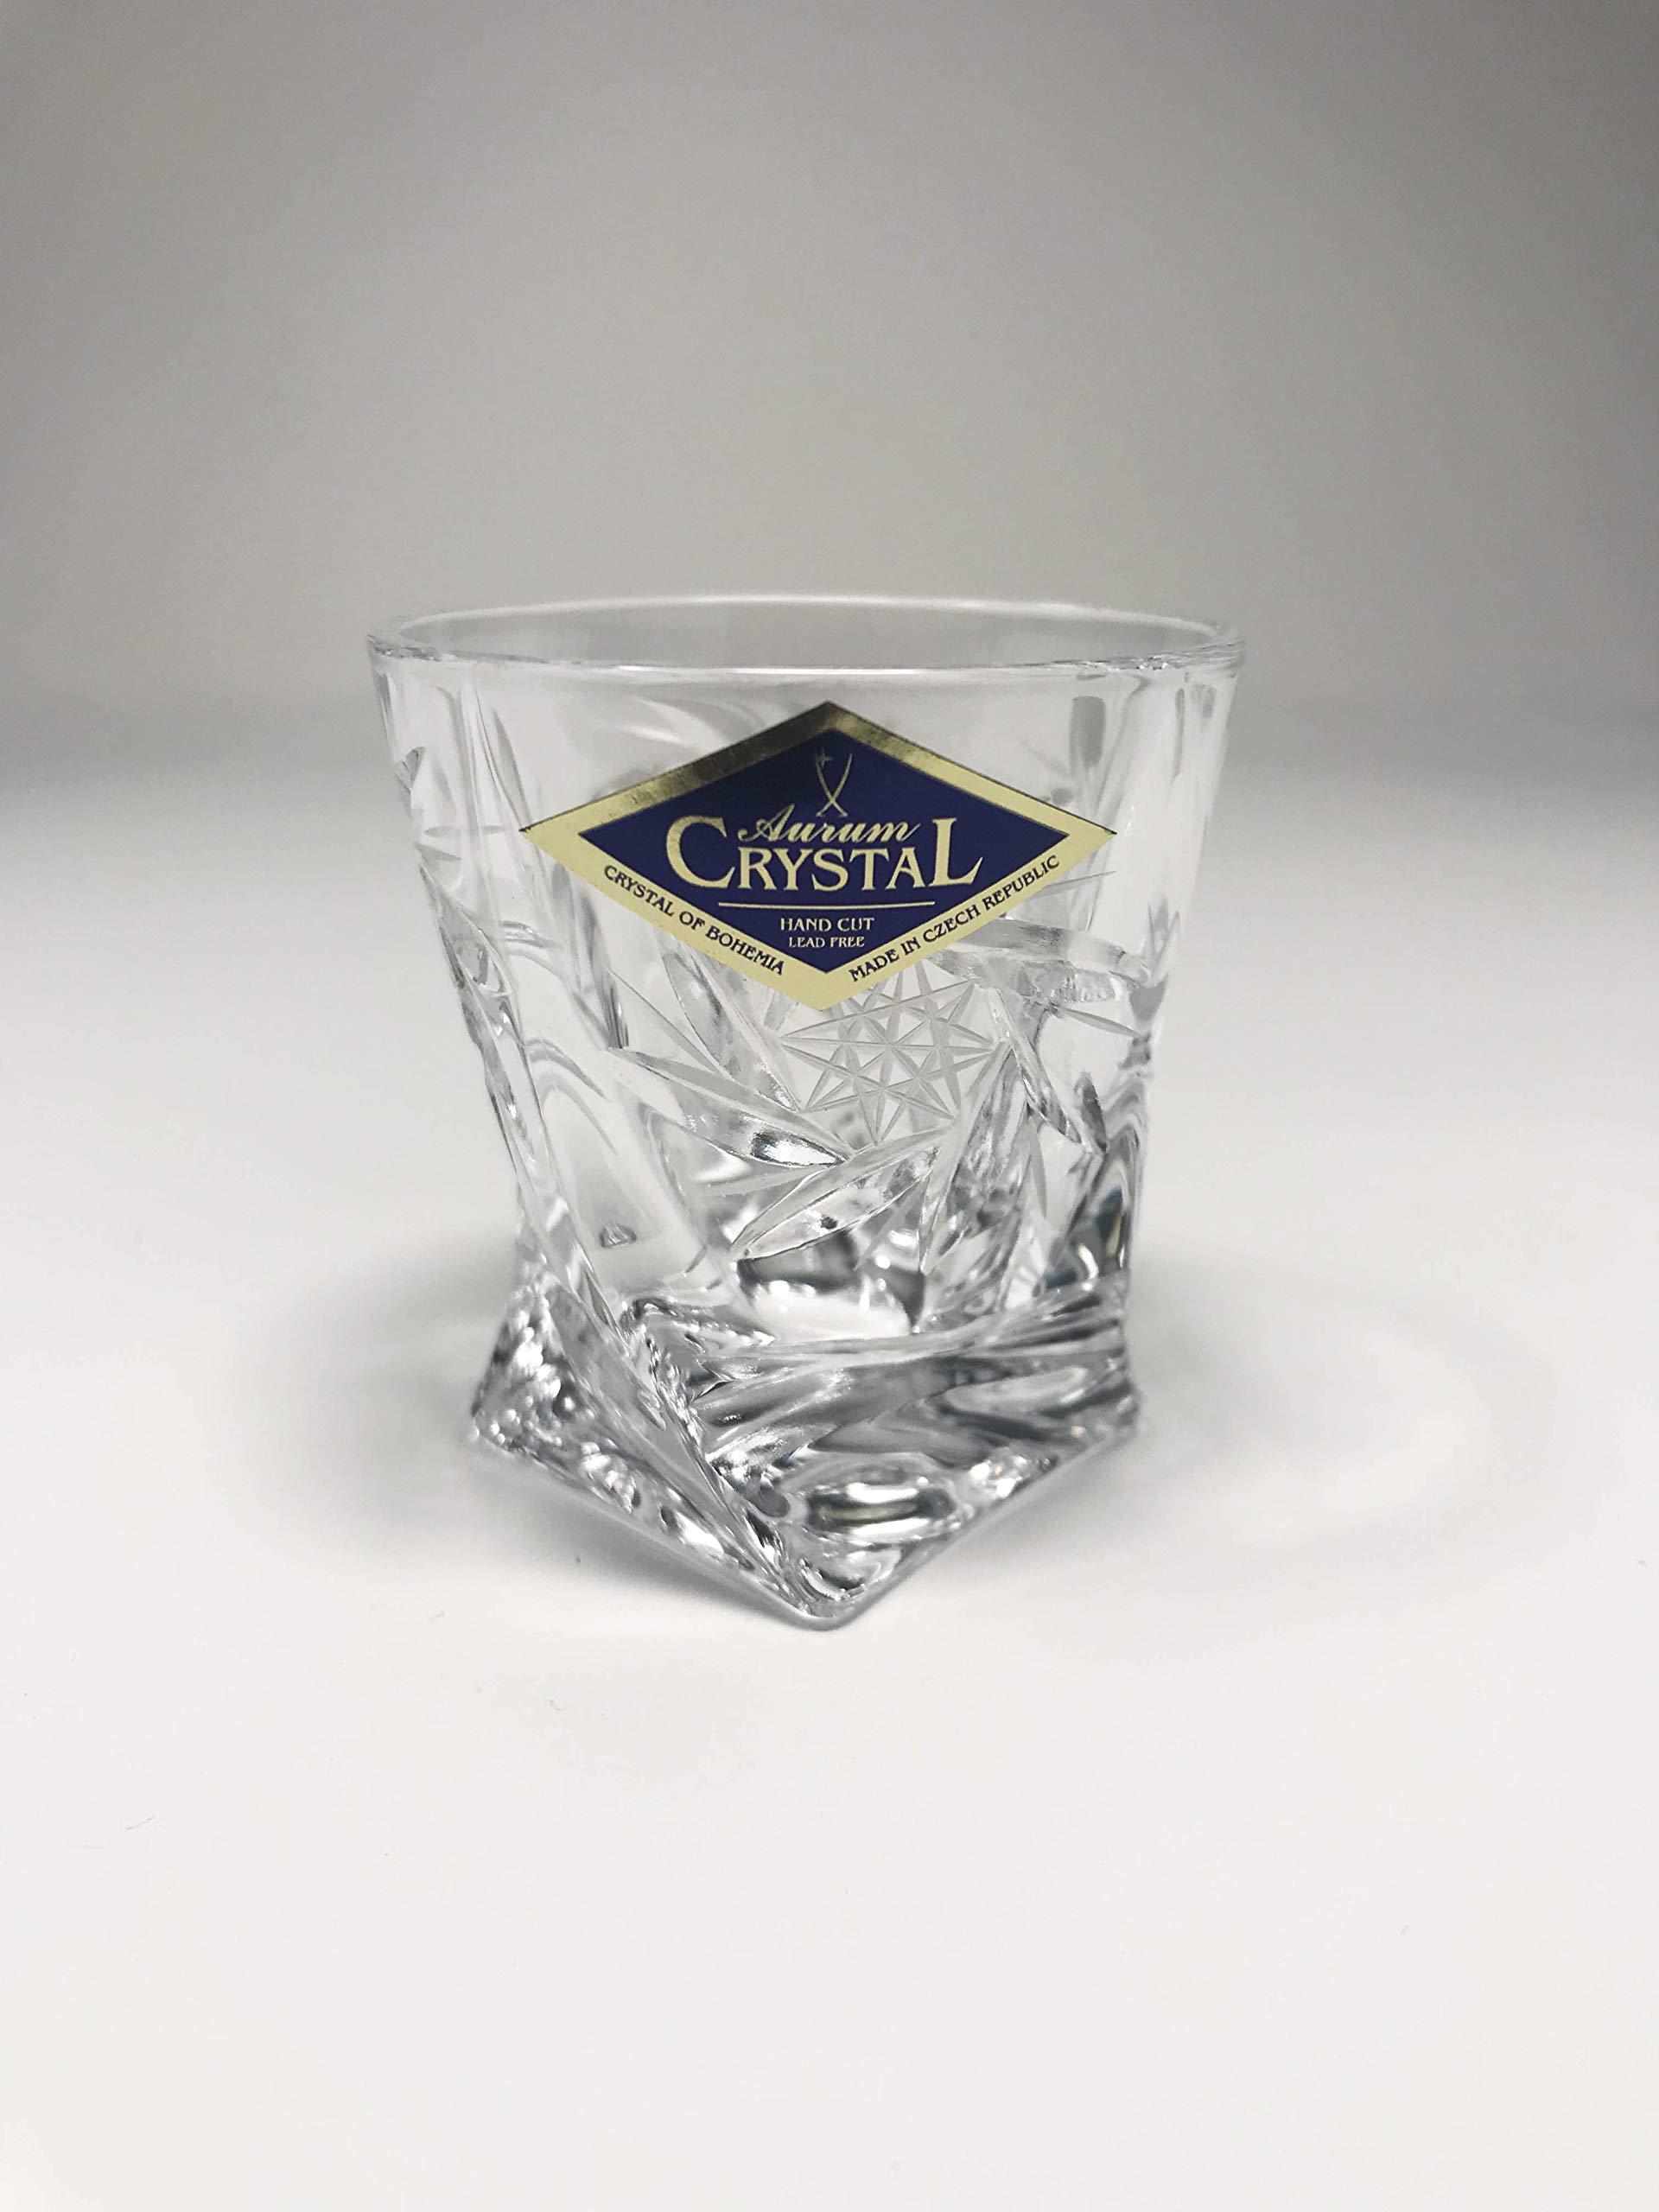 BOHEMIAN CRYSTAL GLASS SHOT GLASSES 2oz. SET OF 6 HAND CUT CRYSTAL GLASS ELEGANT DECORATIVE GIFT SHOTS for VODKA WHISKEY LIQUEUR BRANDY COGNAC VINTAGE EUROPEAN DESIGN CLASSIC CZECH CRYSTAL GLASS